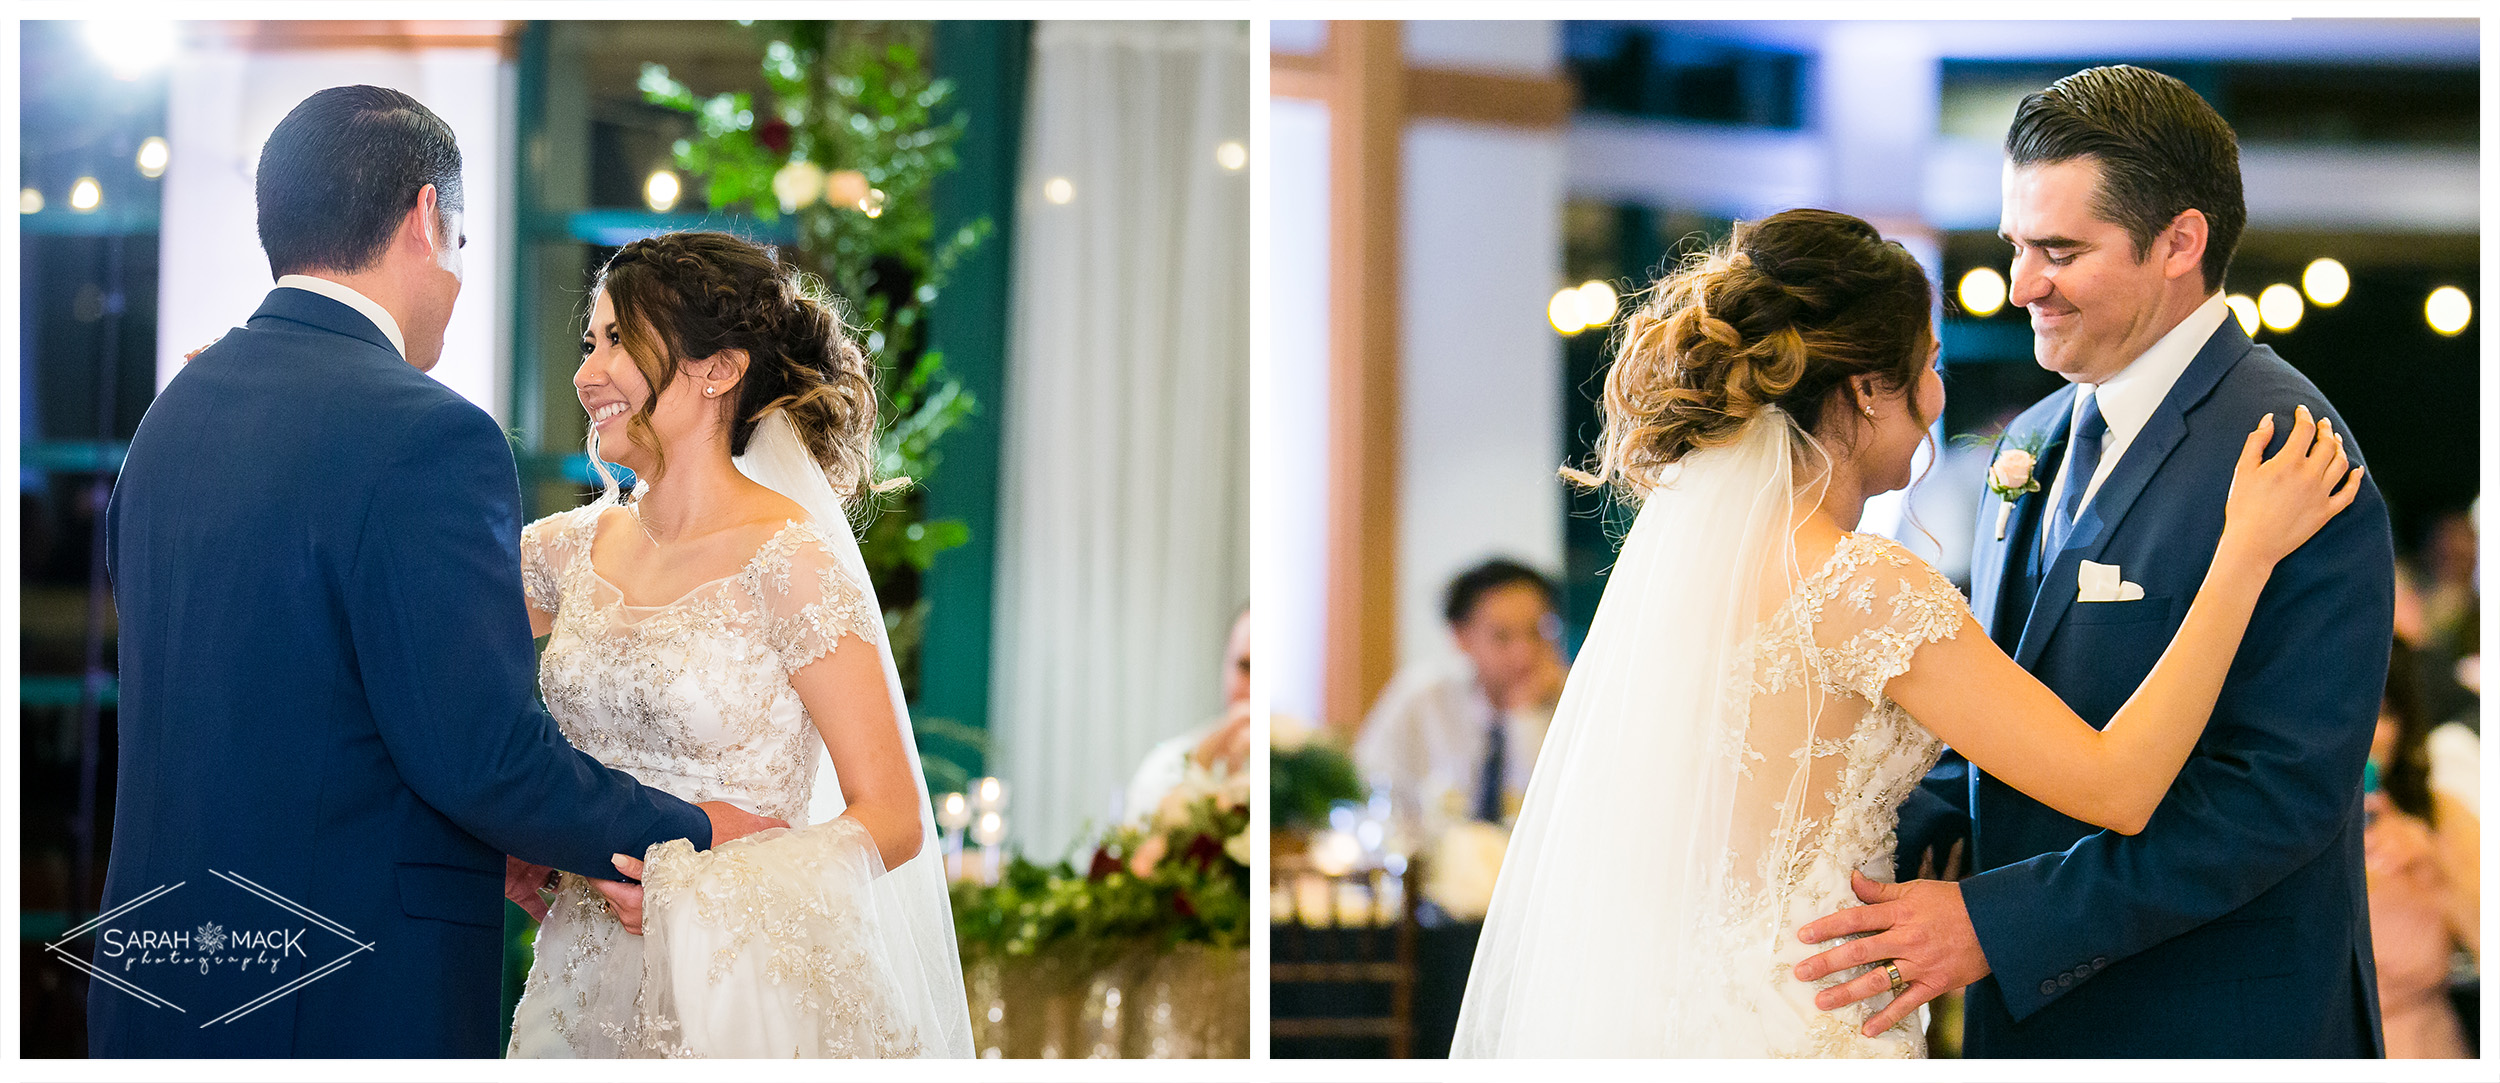 SA-Coyote-Hills-Golf-Course-Fullerton-Wedding-Photography-60.jpg